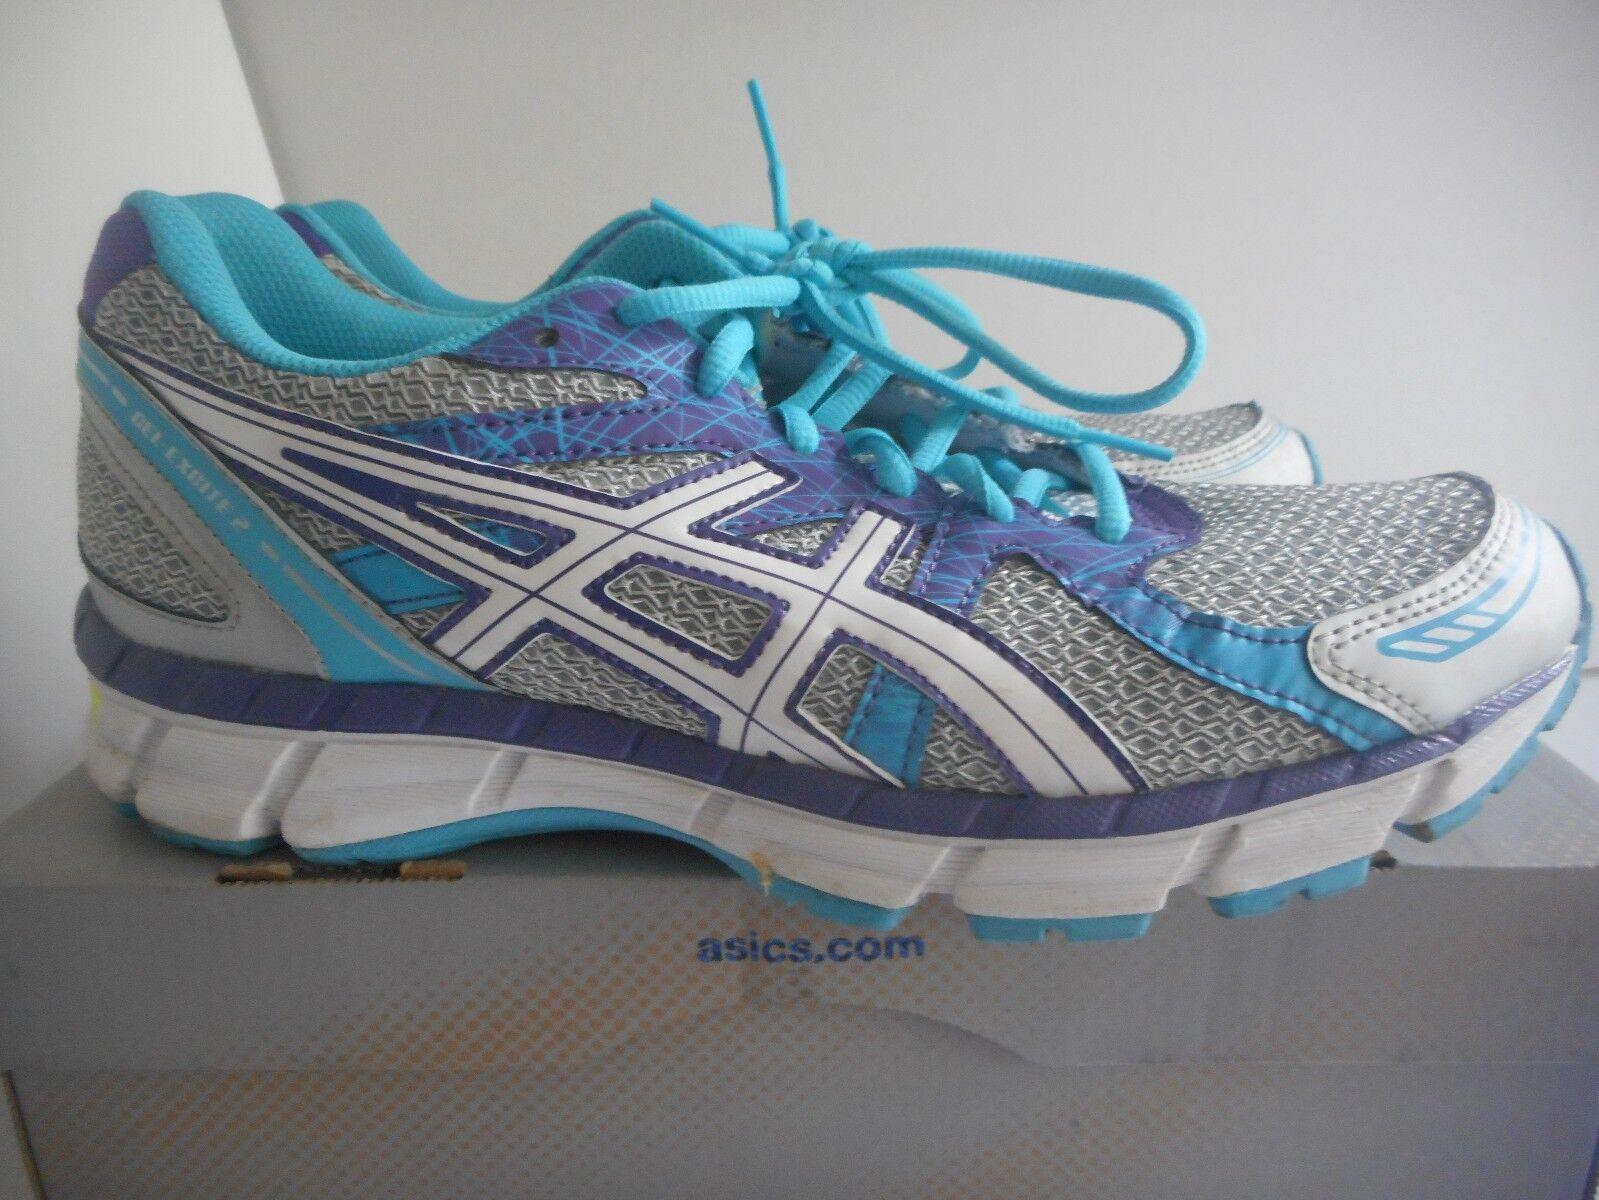 ASICS GEL-EXCITE 2 running sneakers for women sz 10 M